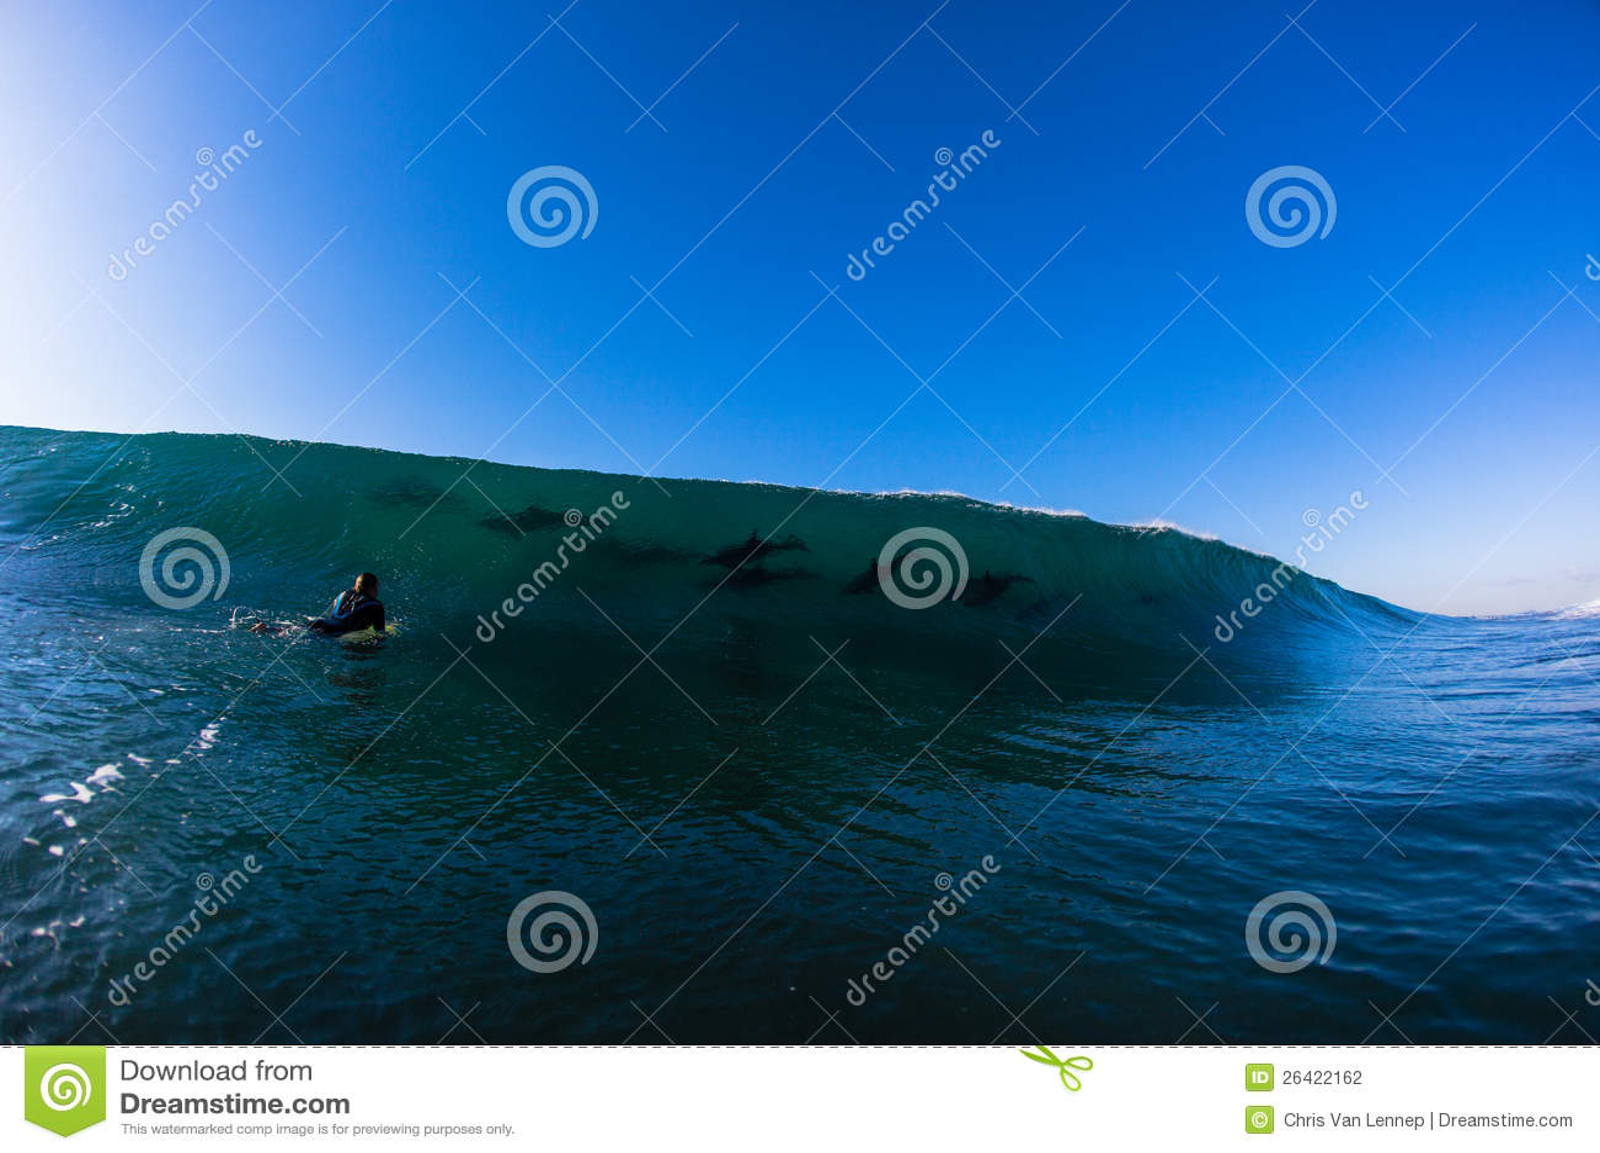 Ocean Wave Dolphins Surfer